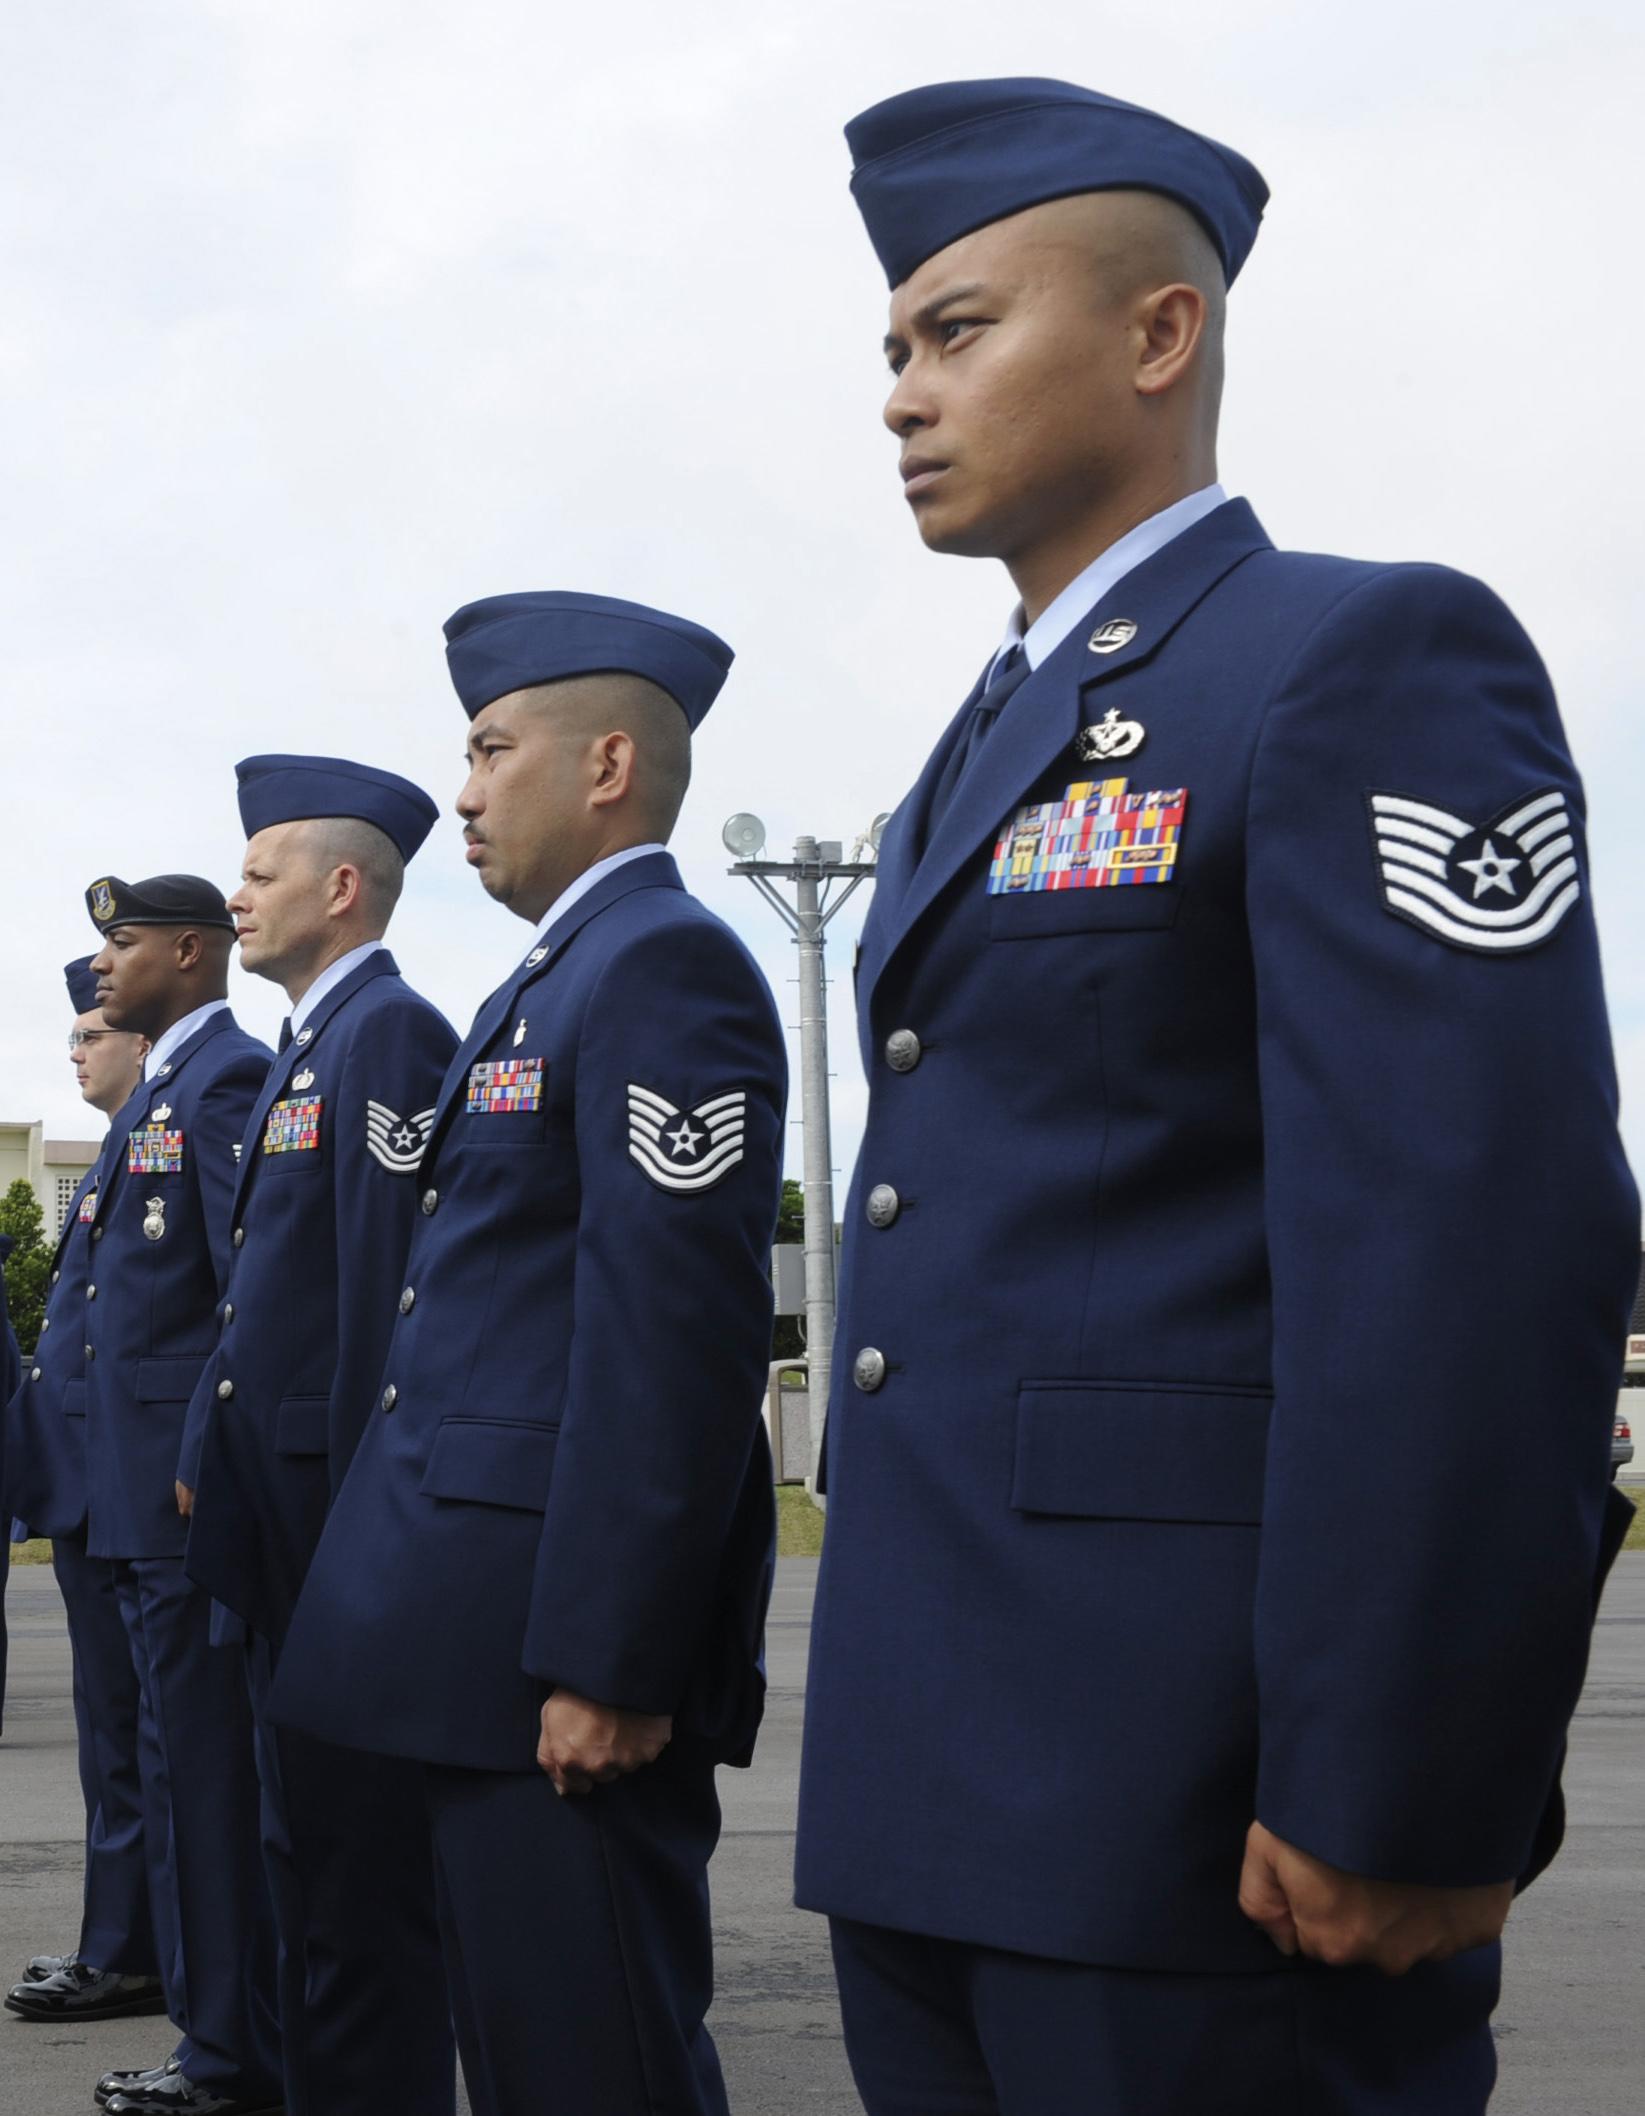 Fantastic Pin Air Force Dress On Pinterest